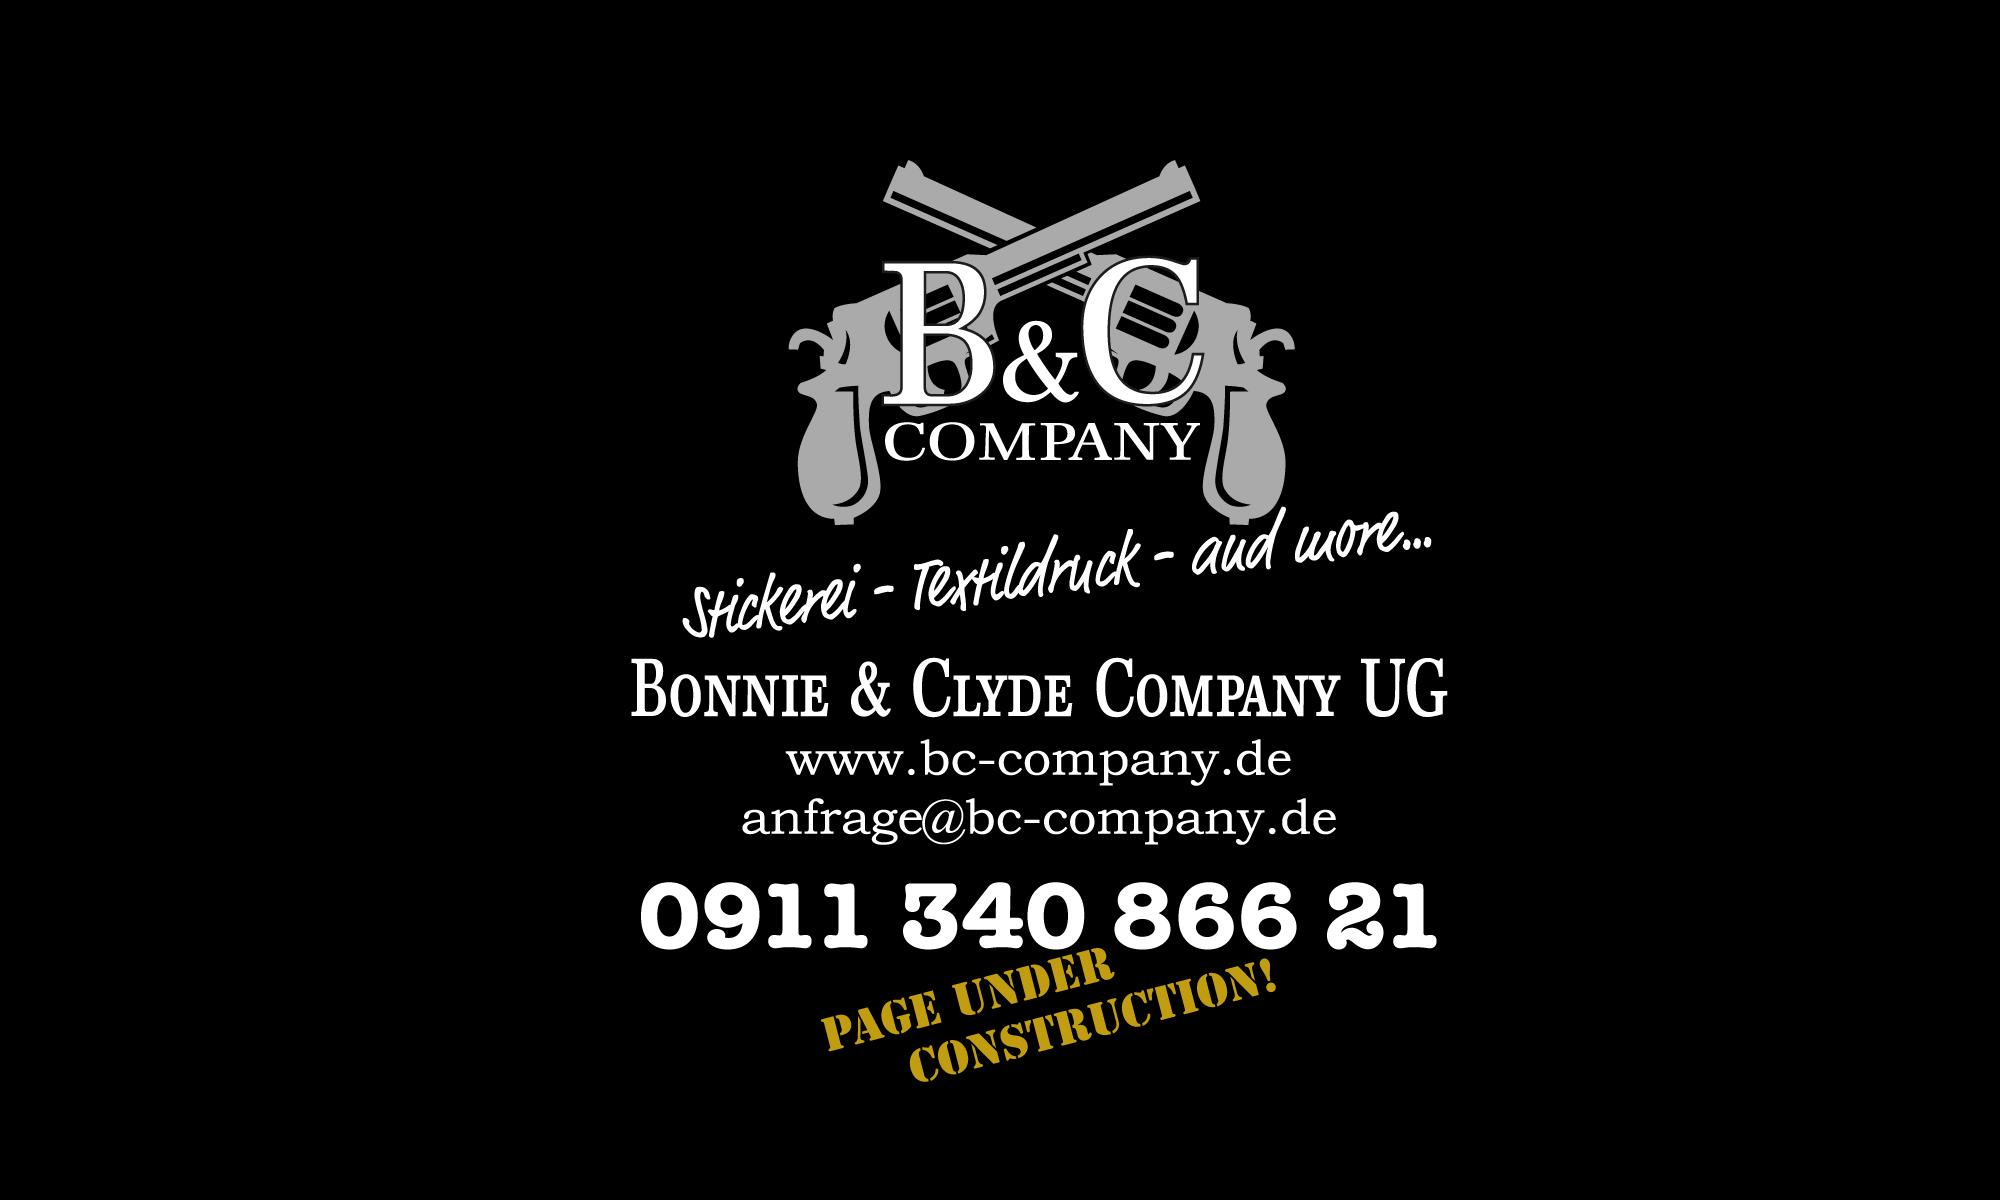 B&C COMPANY